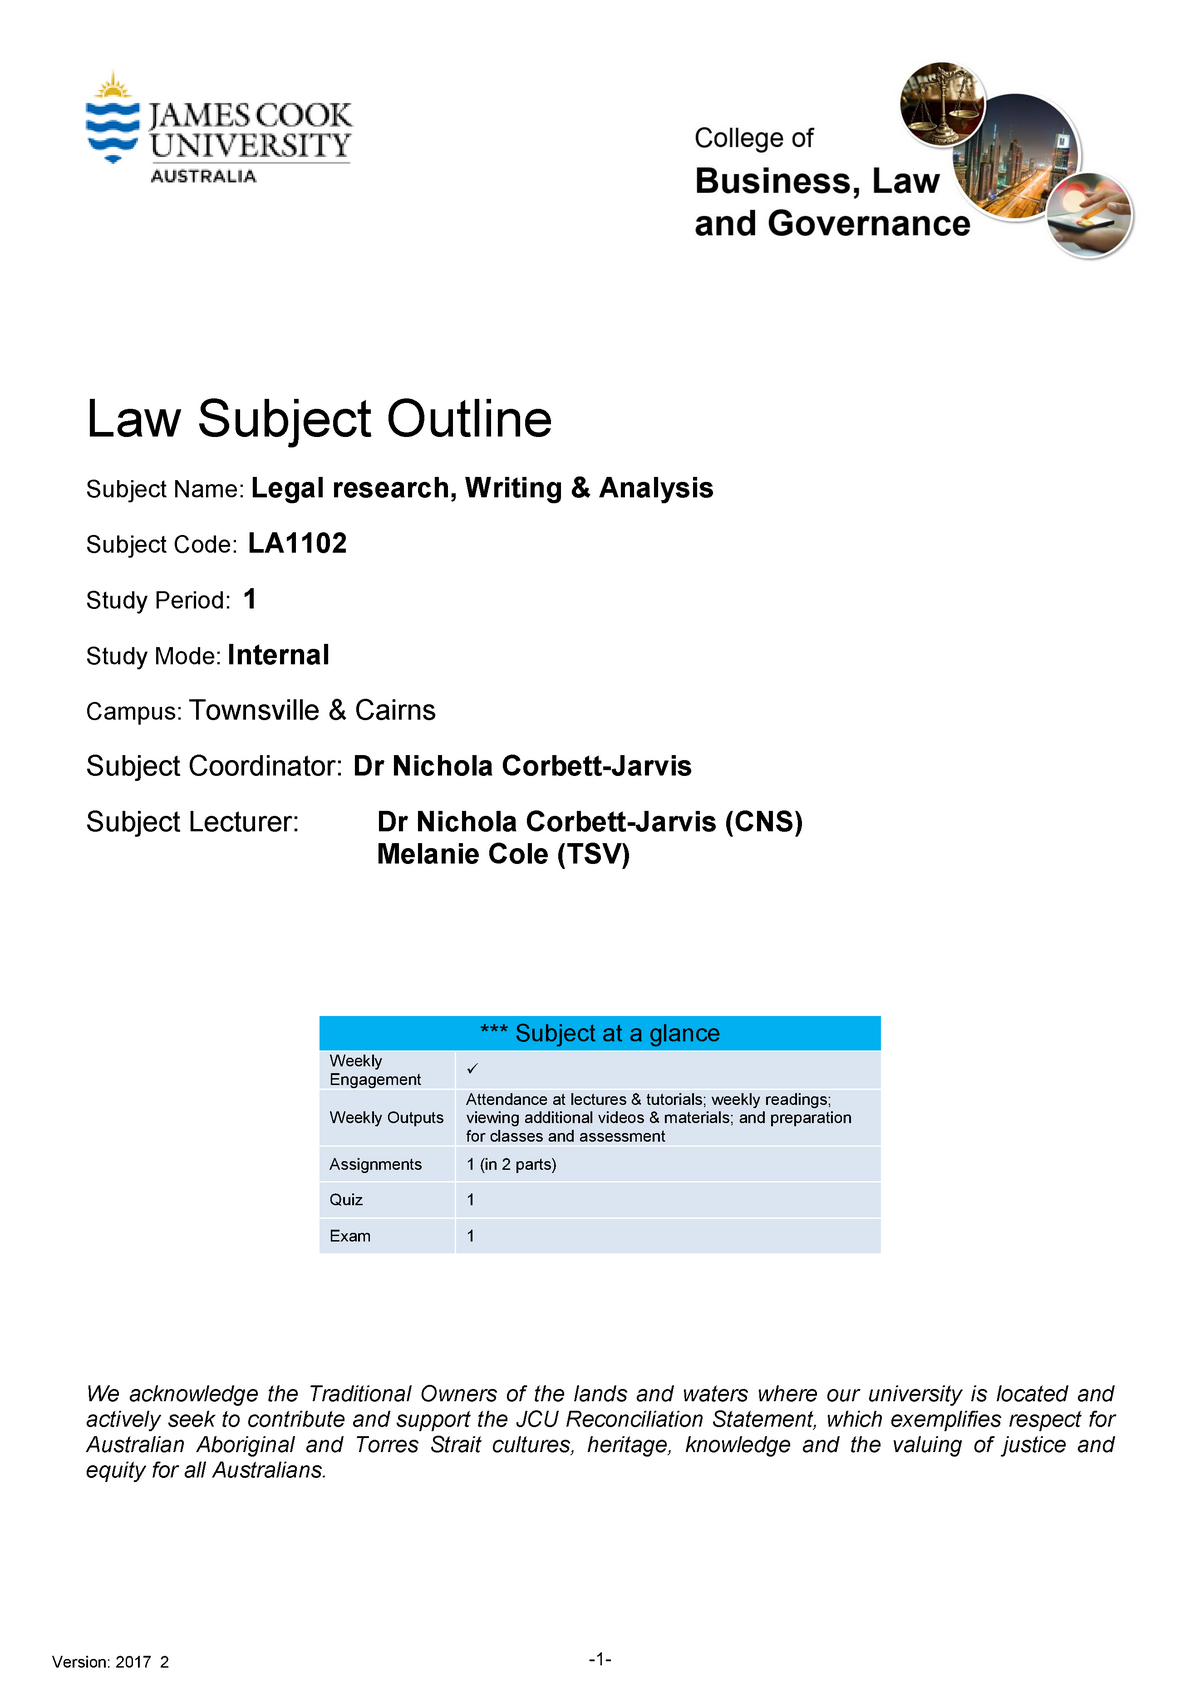 LA1102 subject outline - GR3322:03 Advanced German 2b - JCU